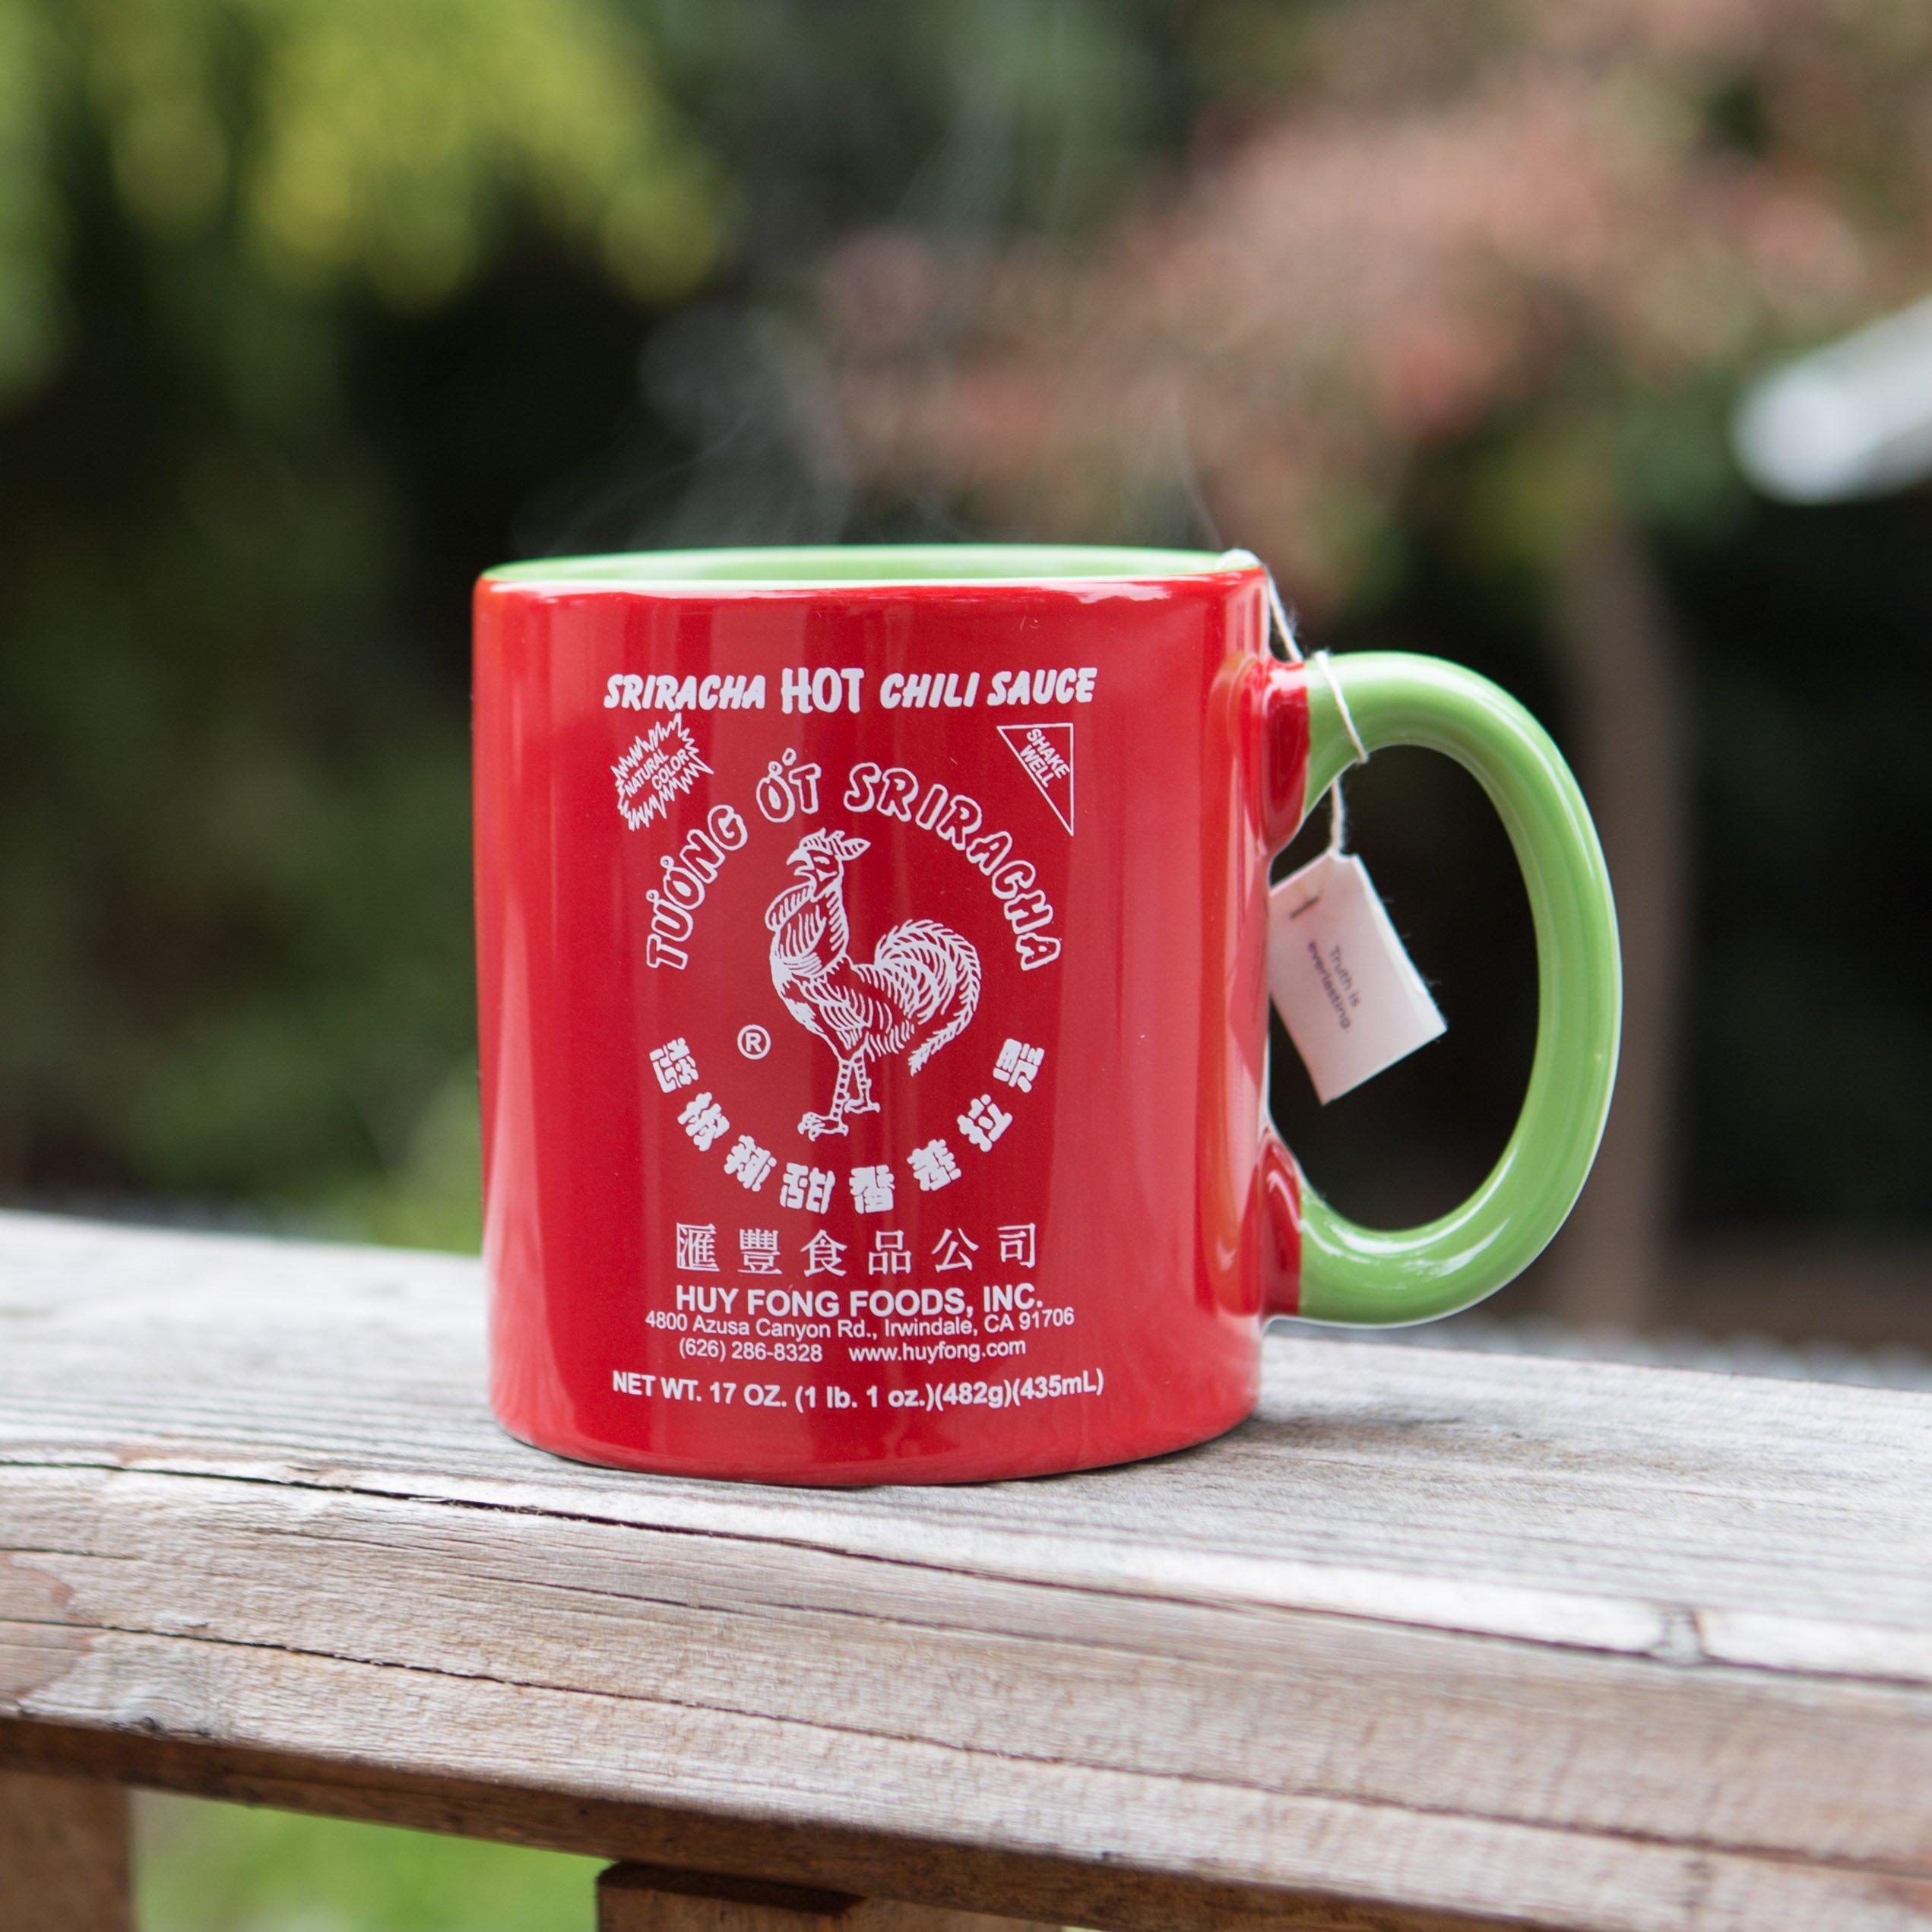 Large 20 oz Sriracha Hot Sauce Red And Green Ceramic Mug by Sriracha2Go (Image #3)